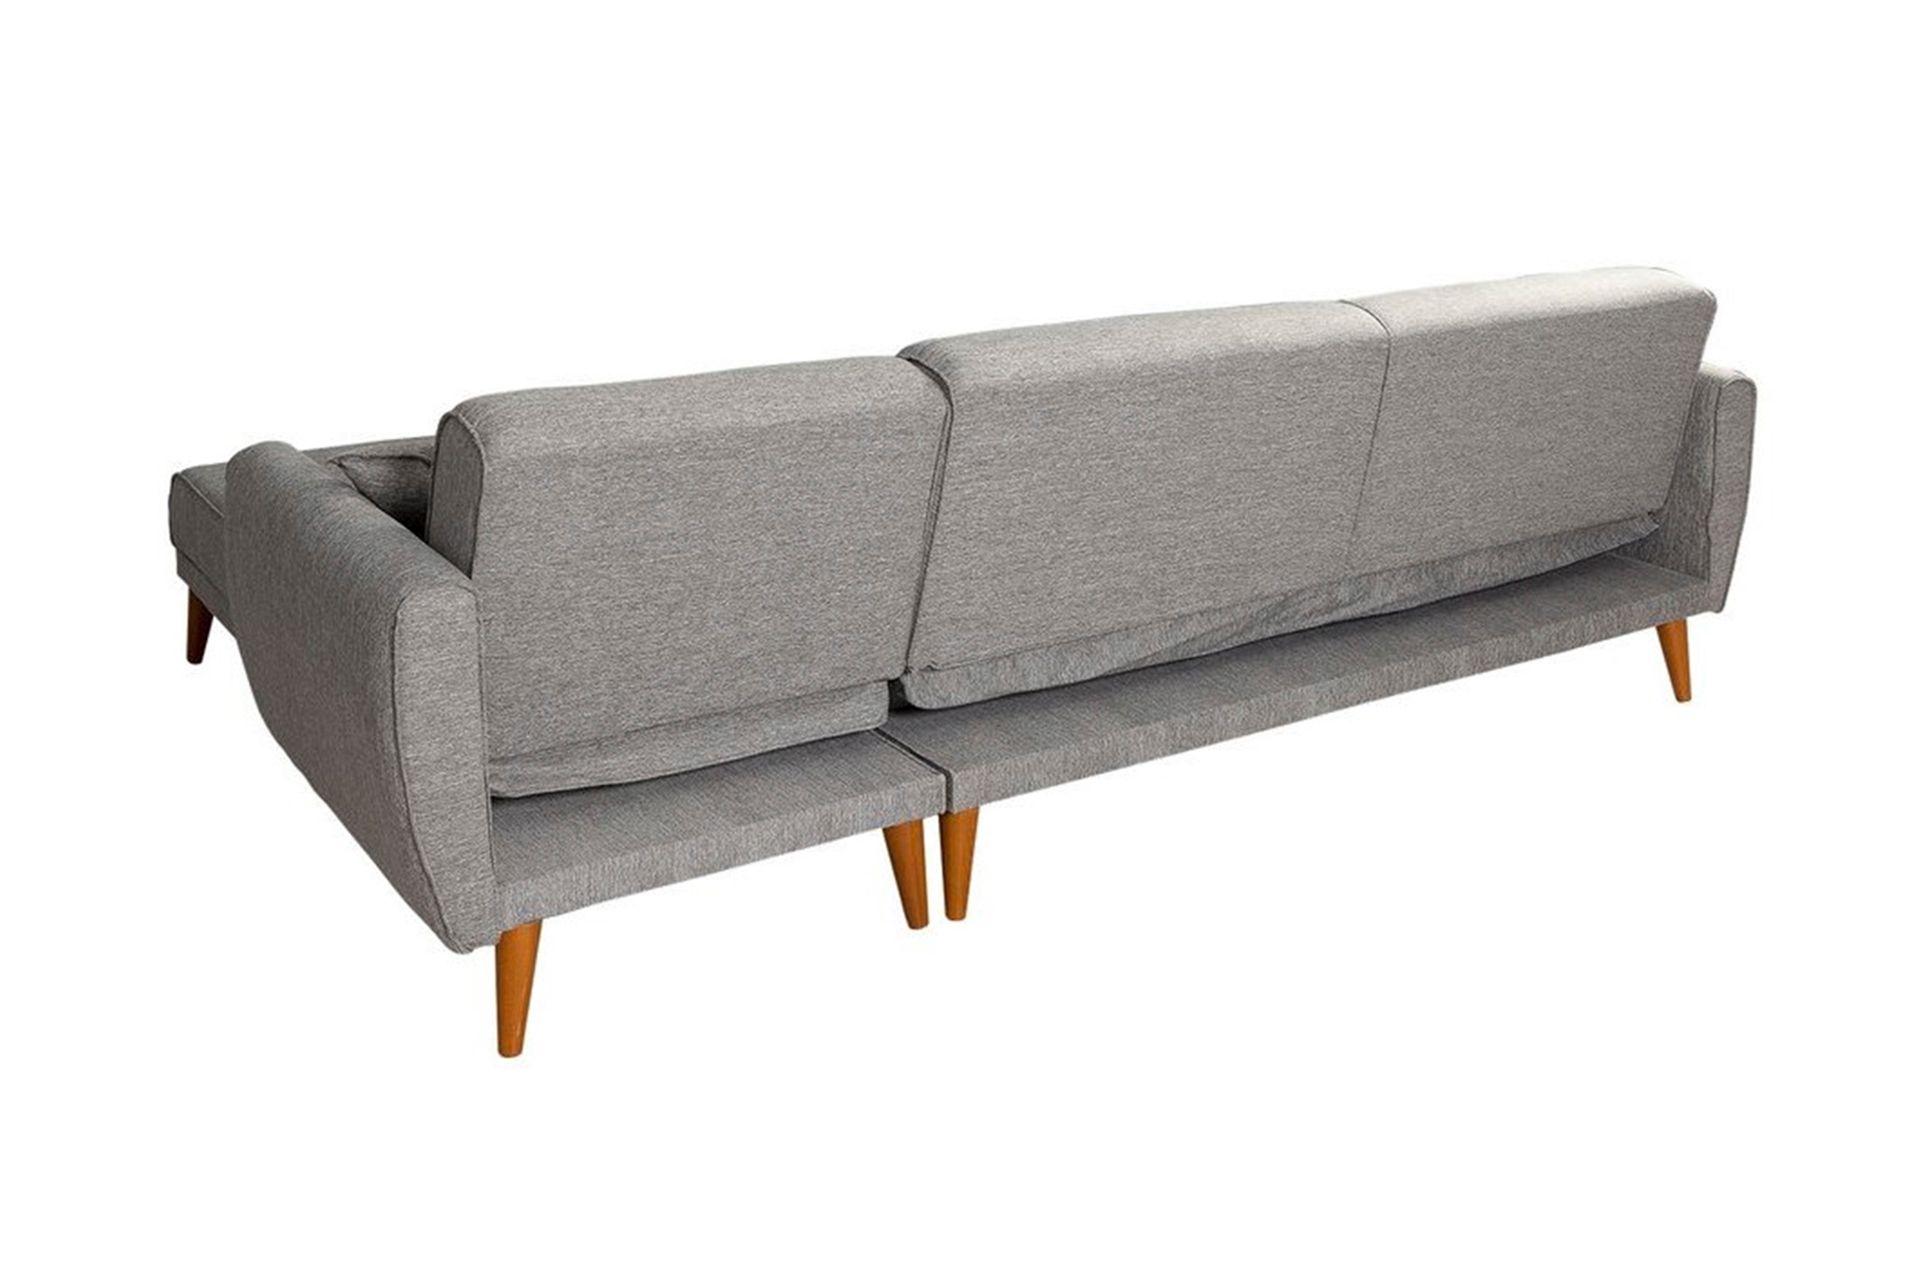 Aria Corner Sofa Bed, Grey (Right)